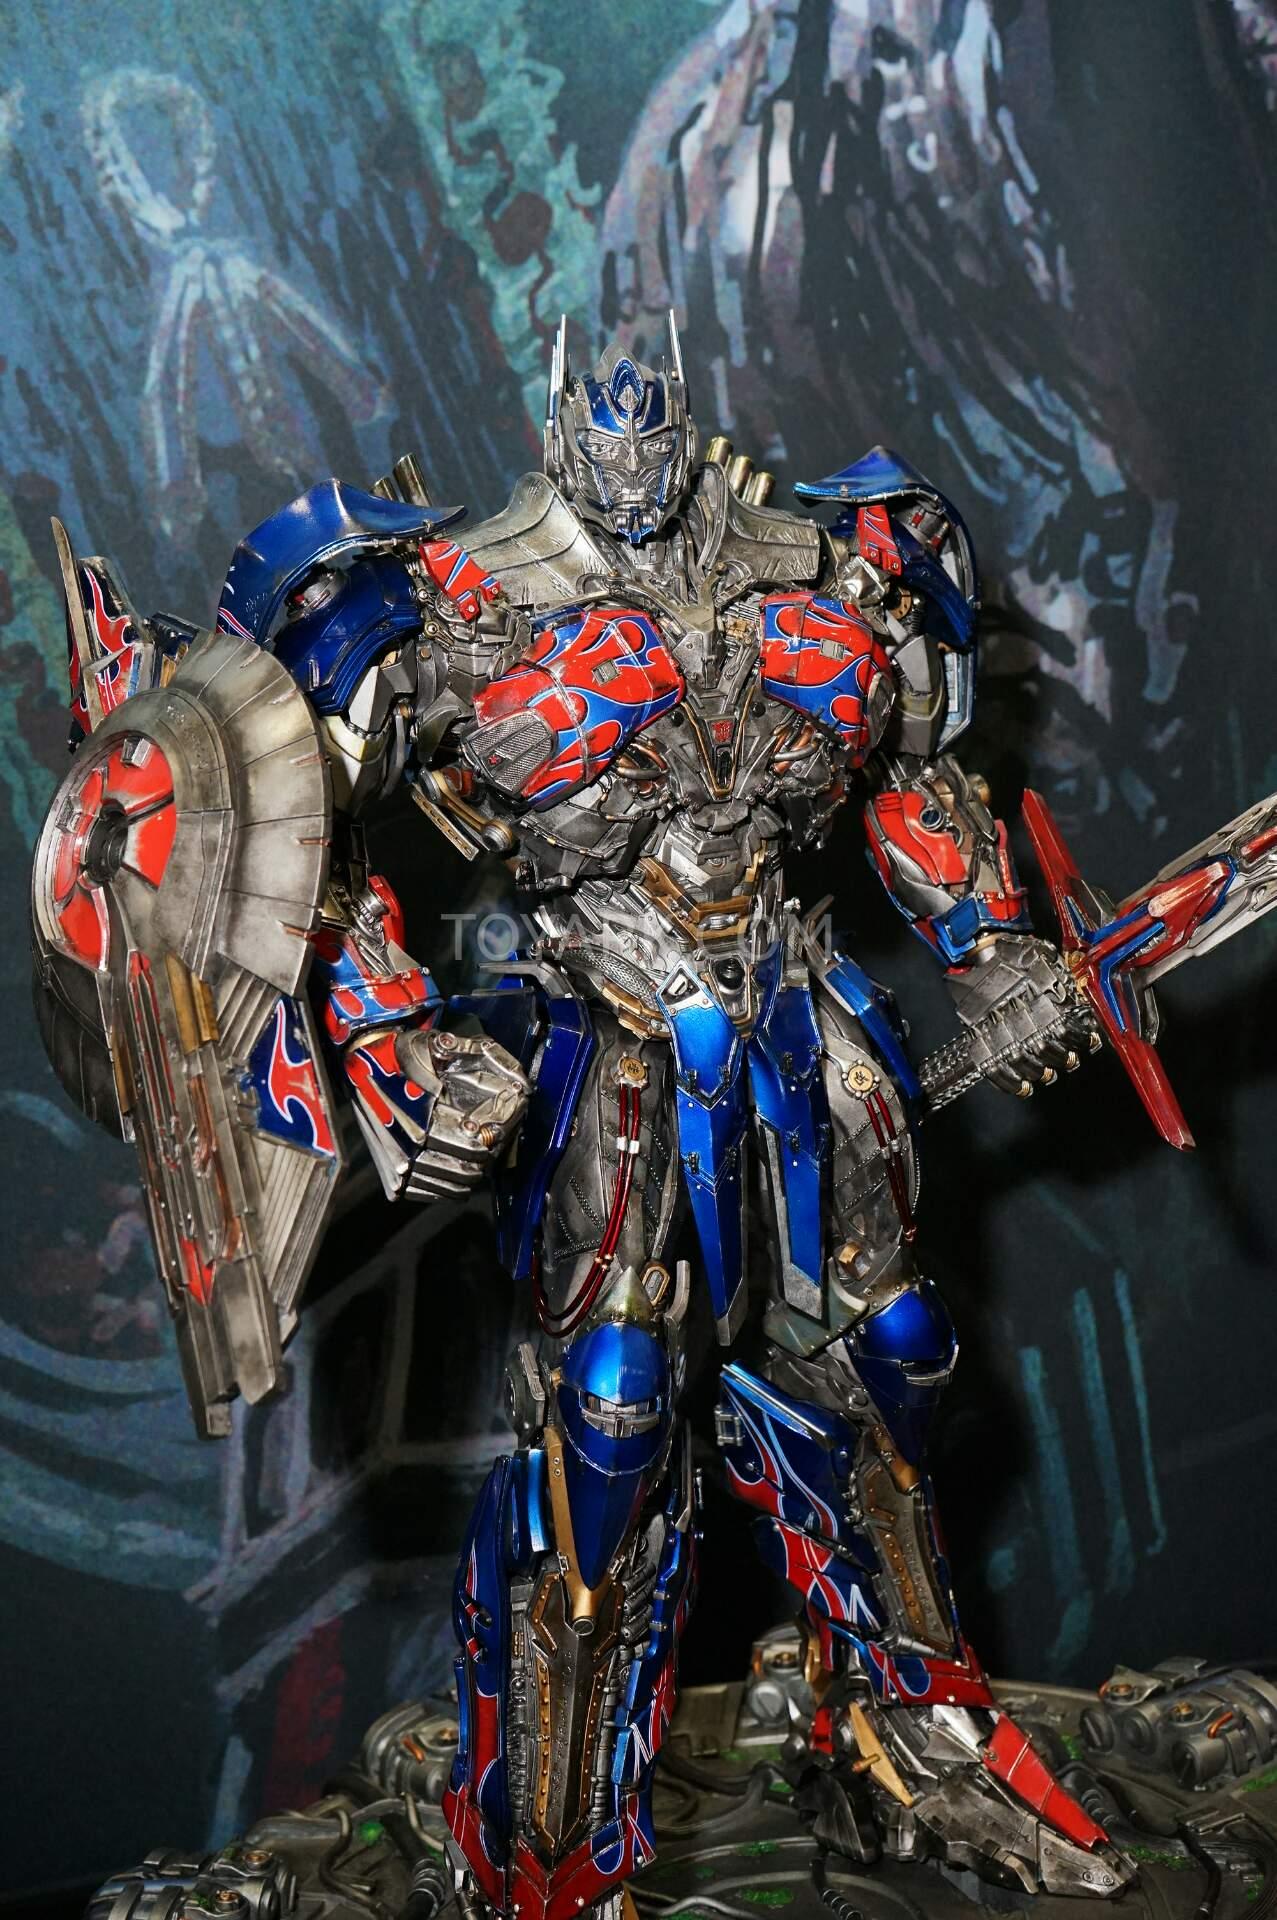 Transformers 1 Stream Hdfilme